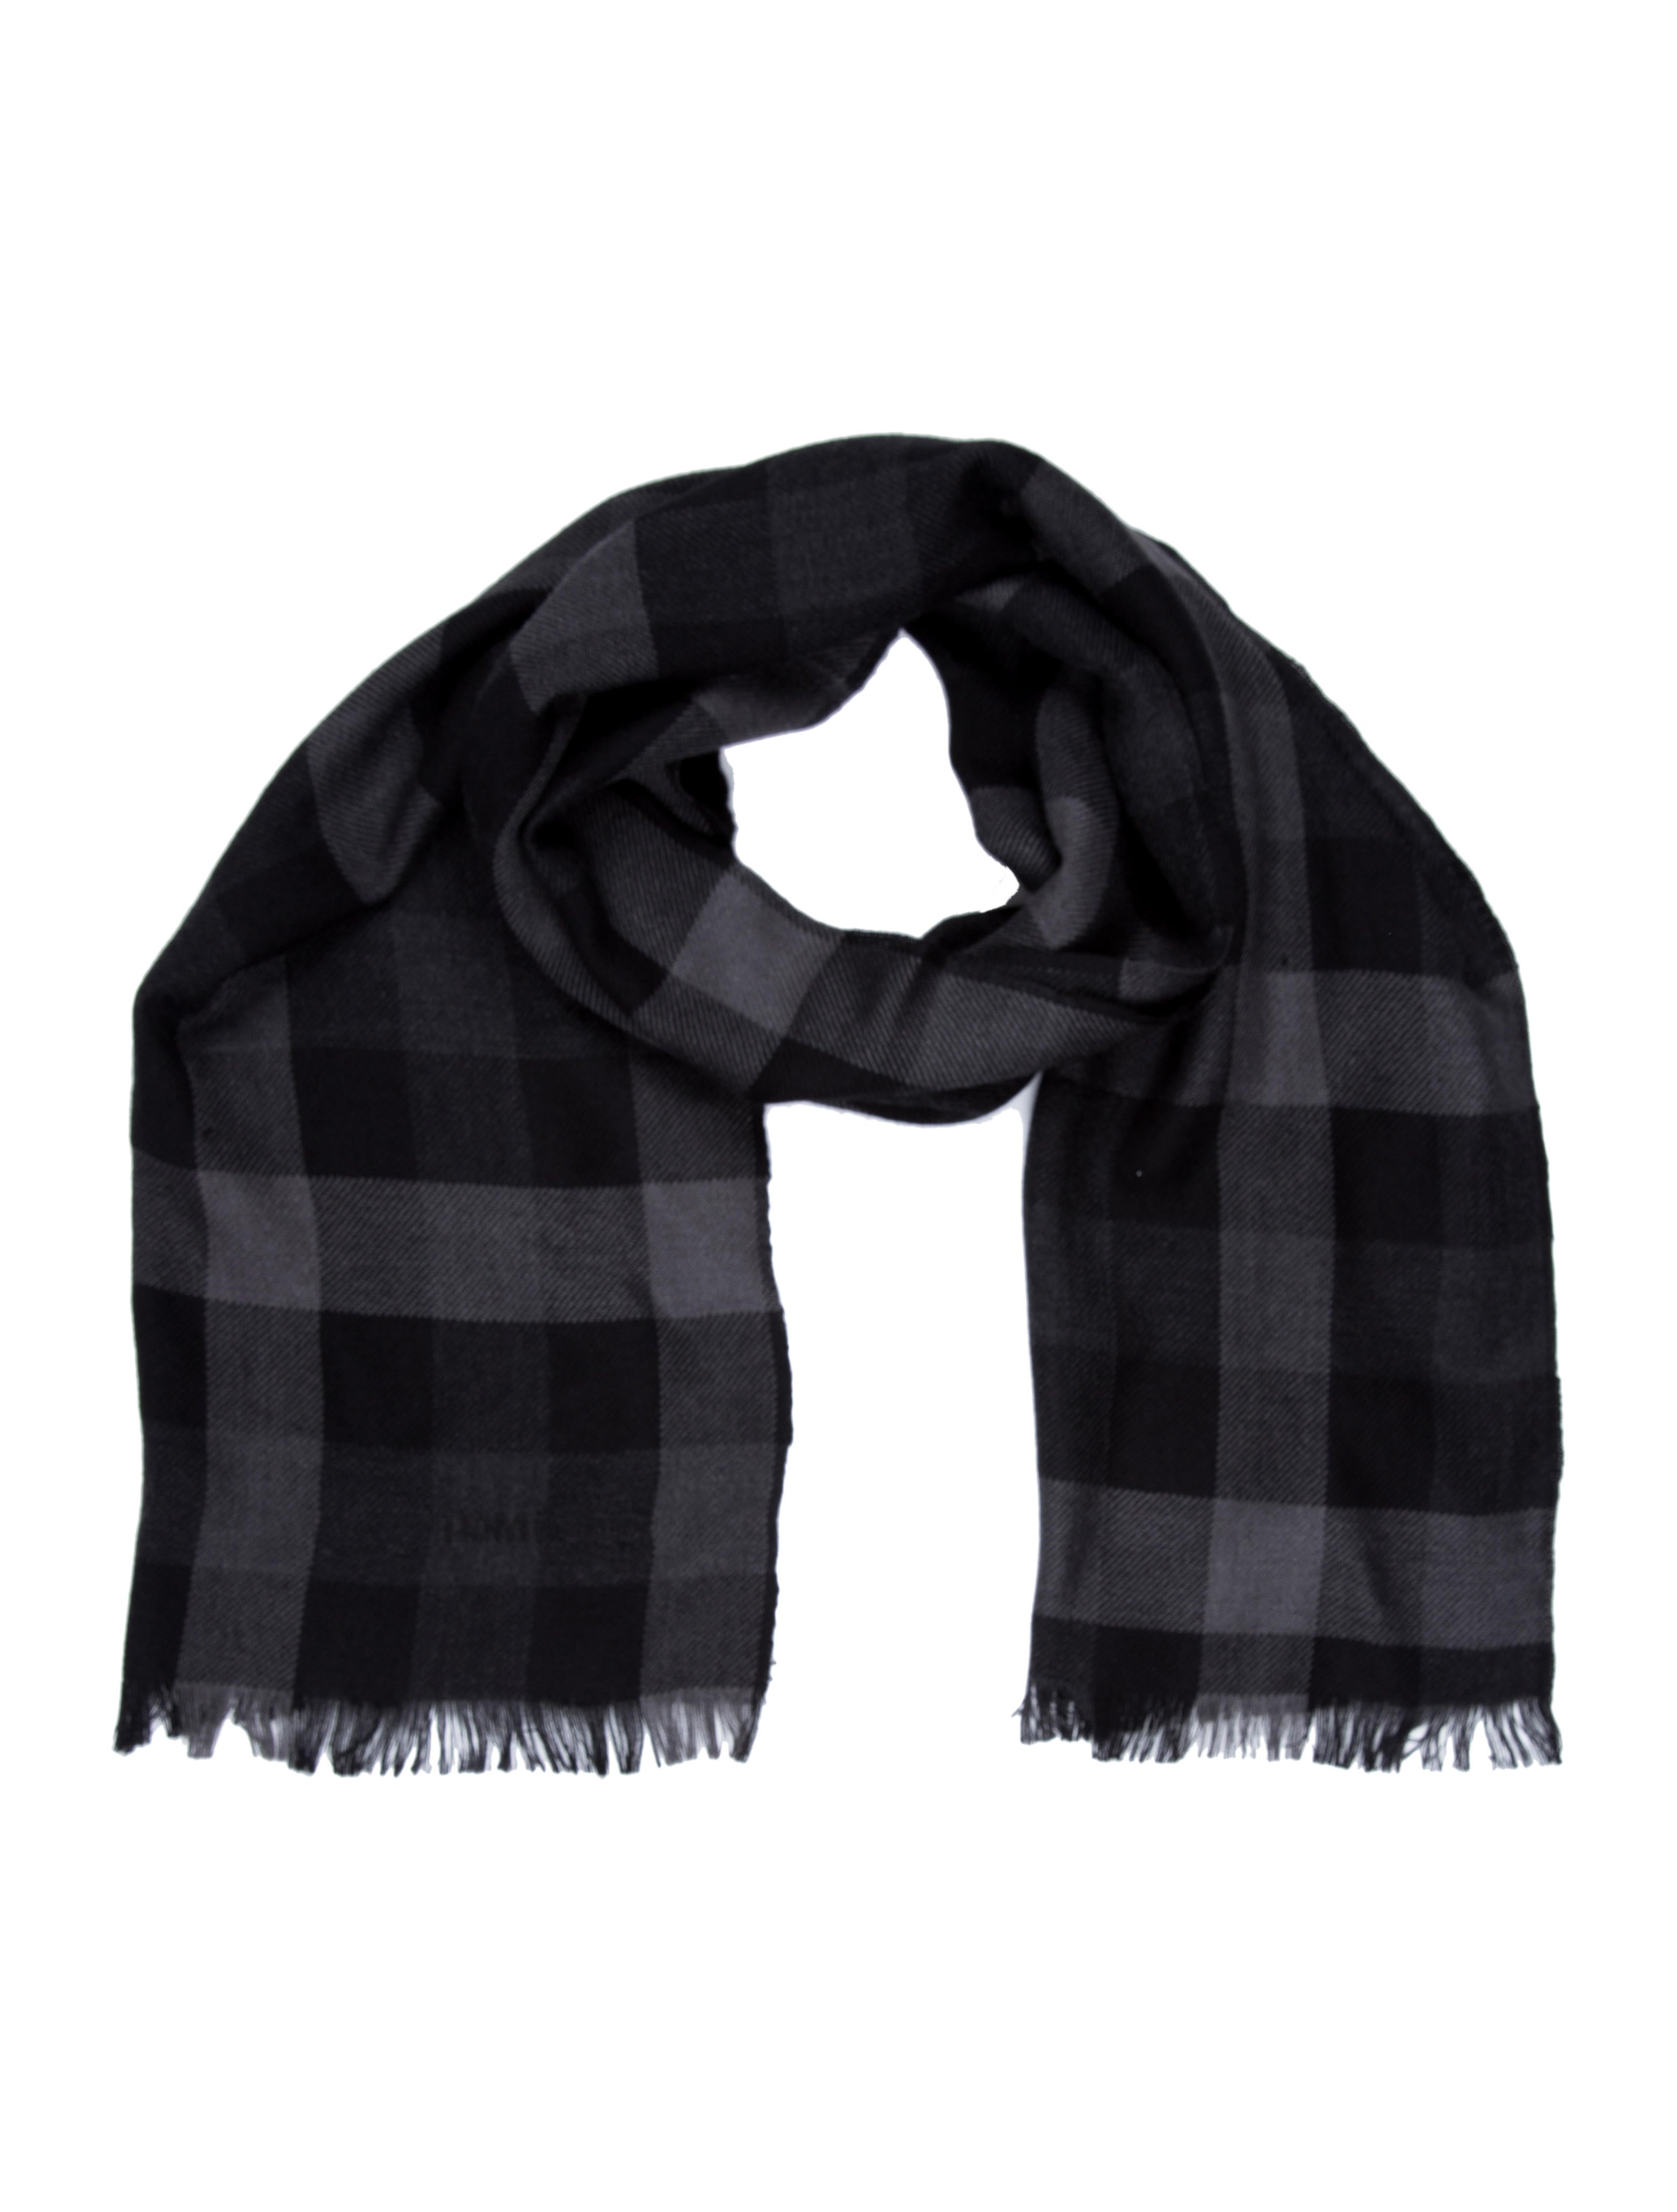 tom ford silk blend scarf w tags accessories